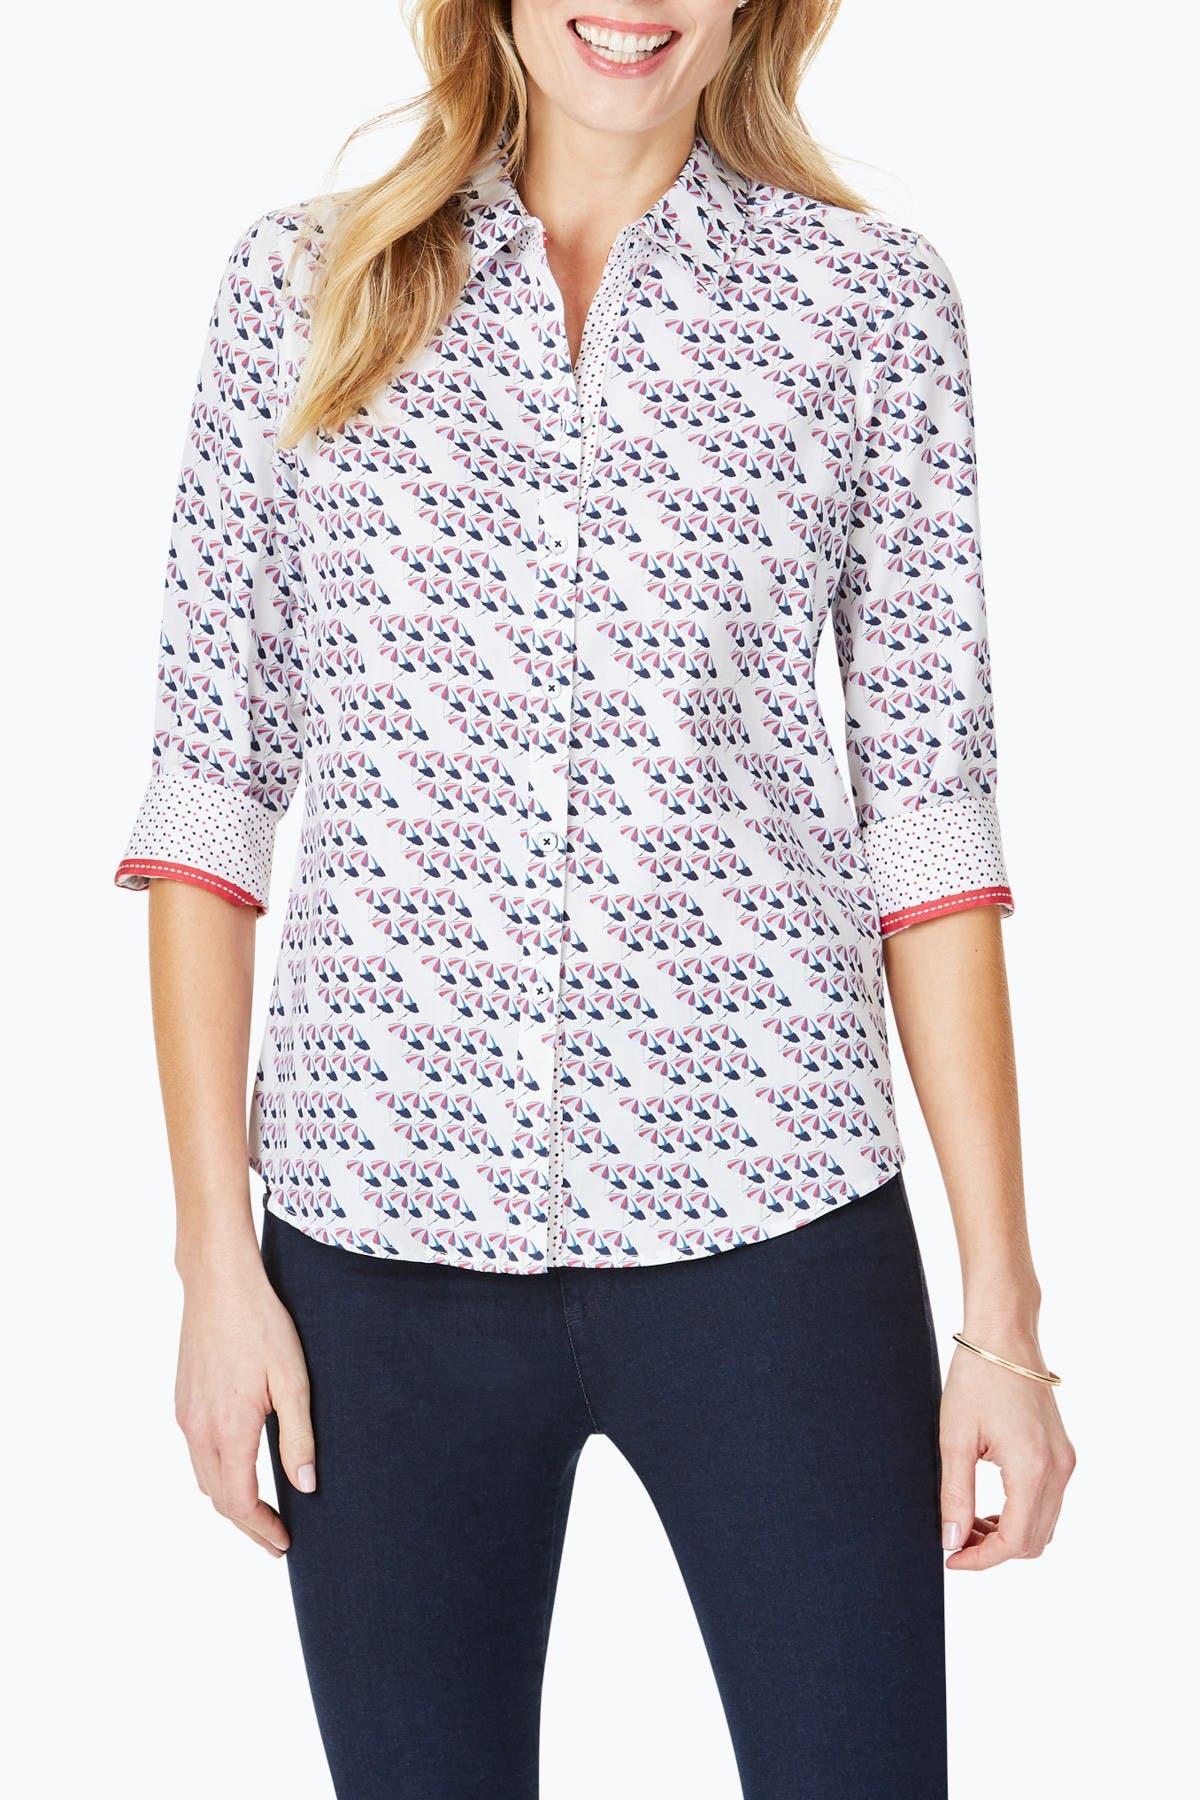 Image of FOXCROFT Ava Umbrella Print 3/4 Sleeve Shirt